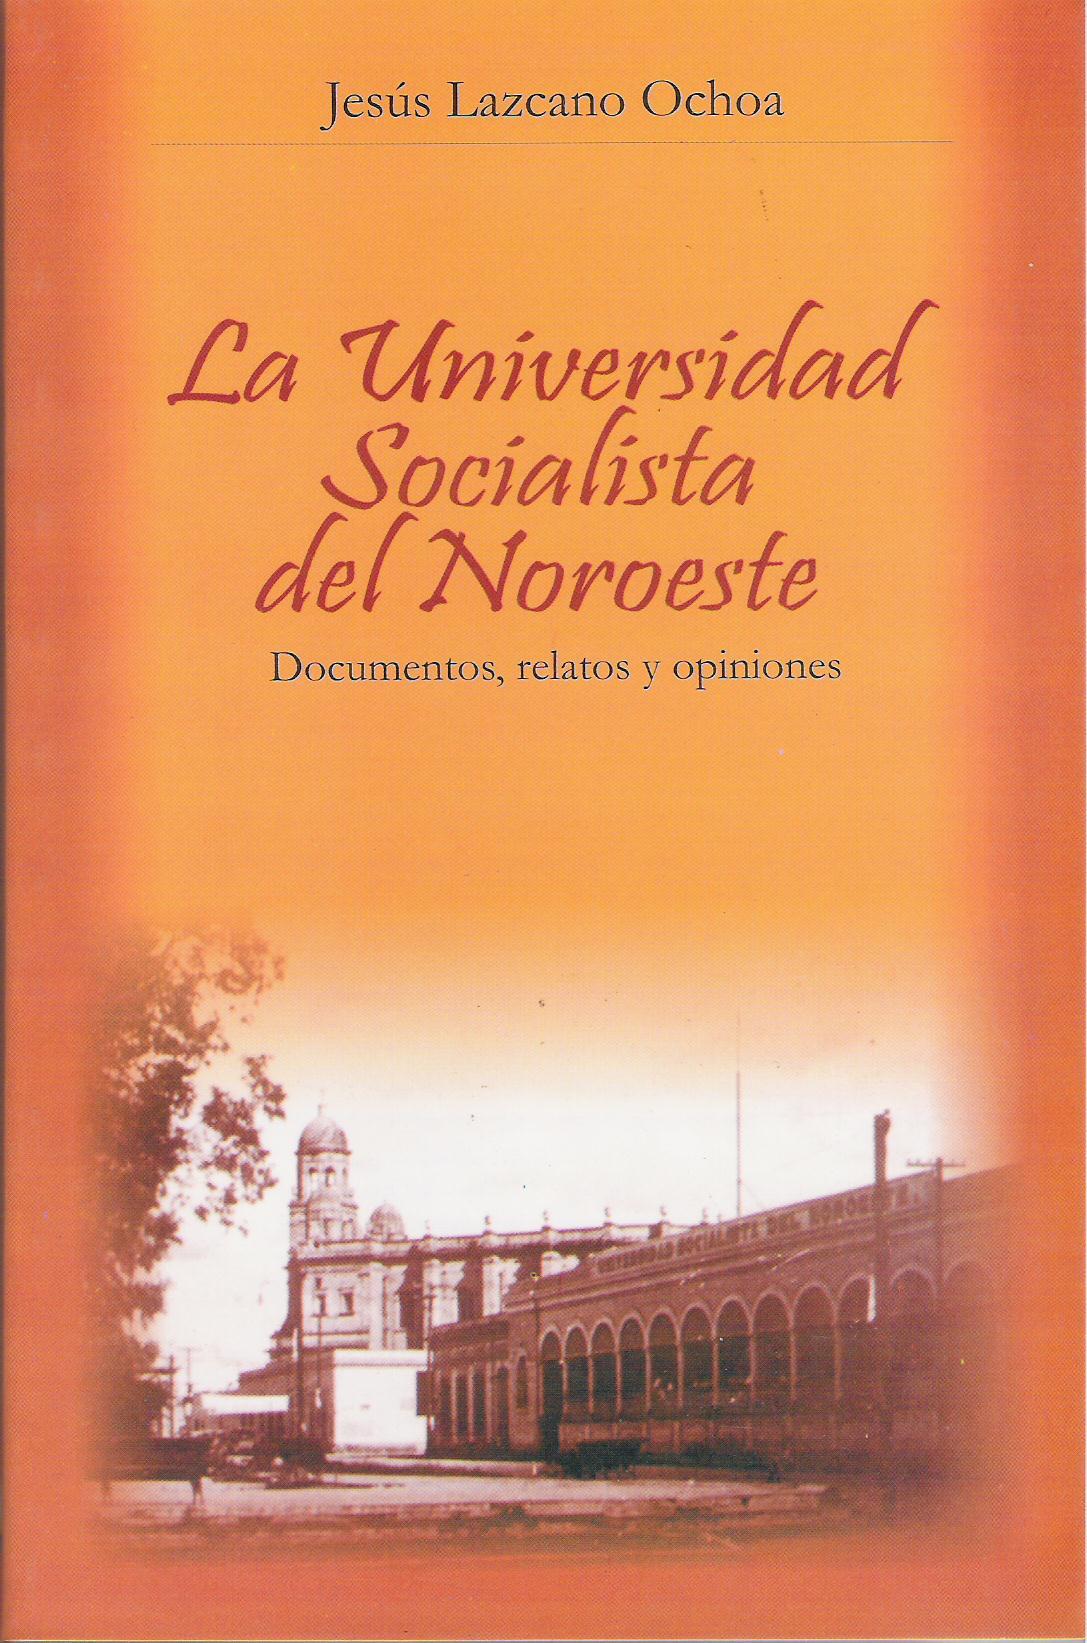 Image result for imágenes de profesor Jesús Lazcano Ochoa